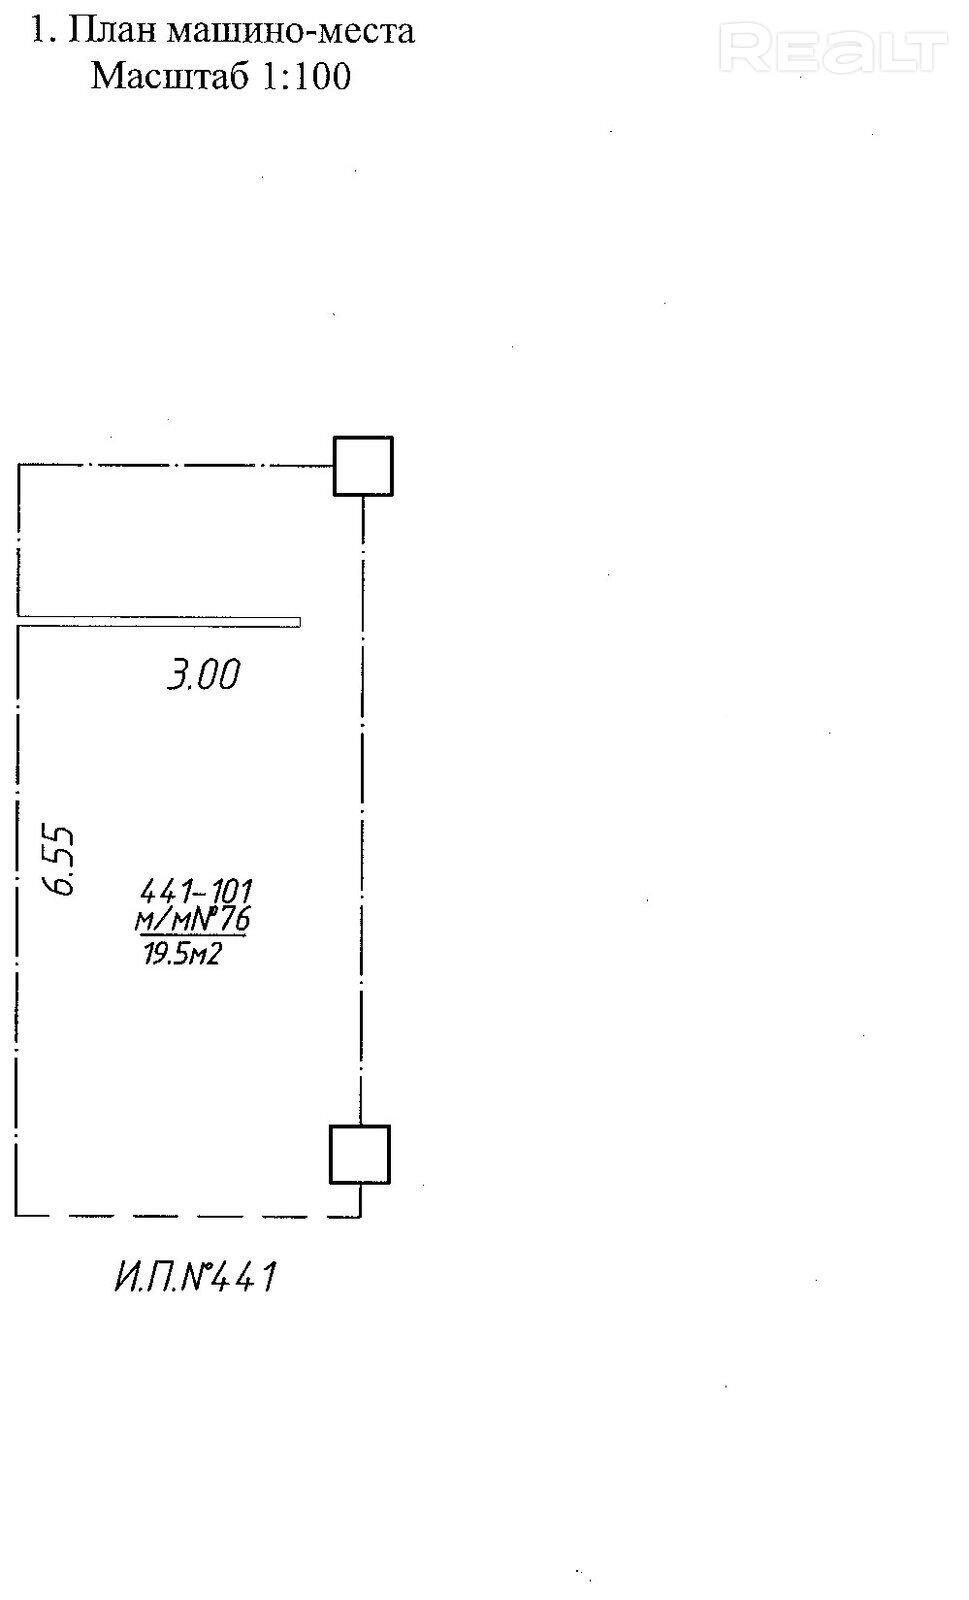 Продается 4-х комнатная квартира, ул. Сторожовская д.6 - фото №3